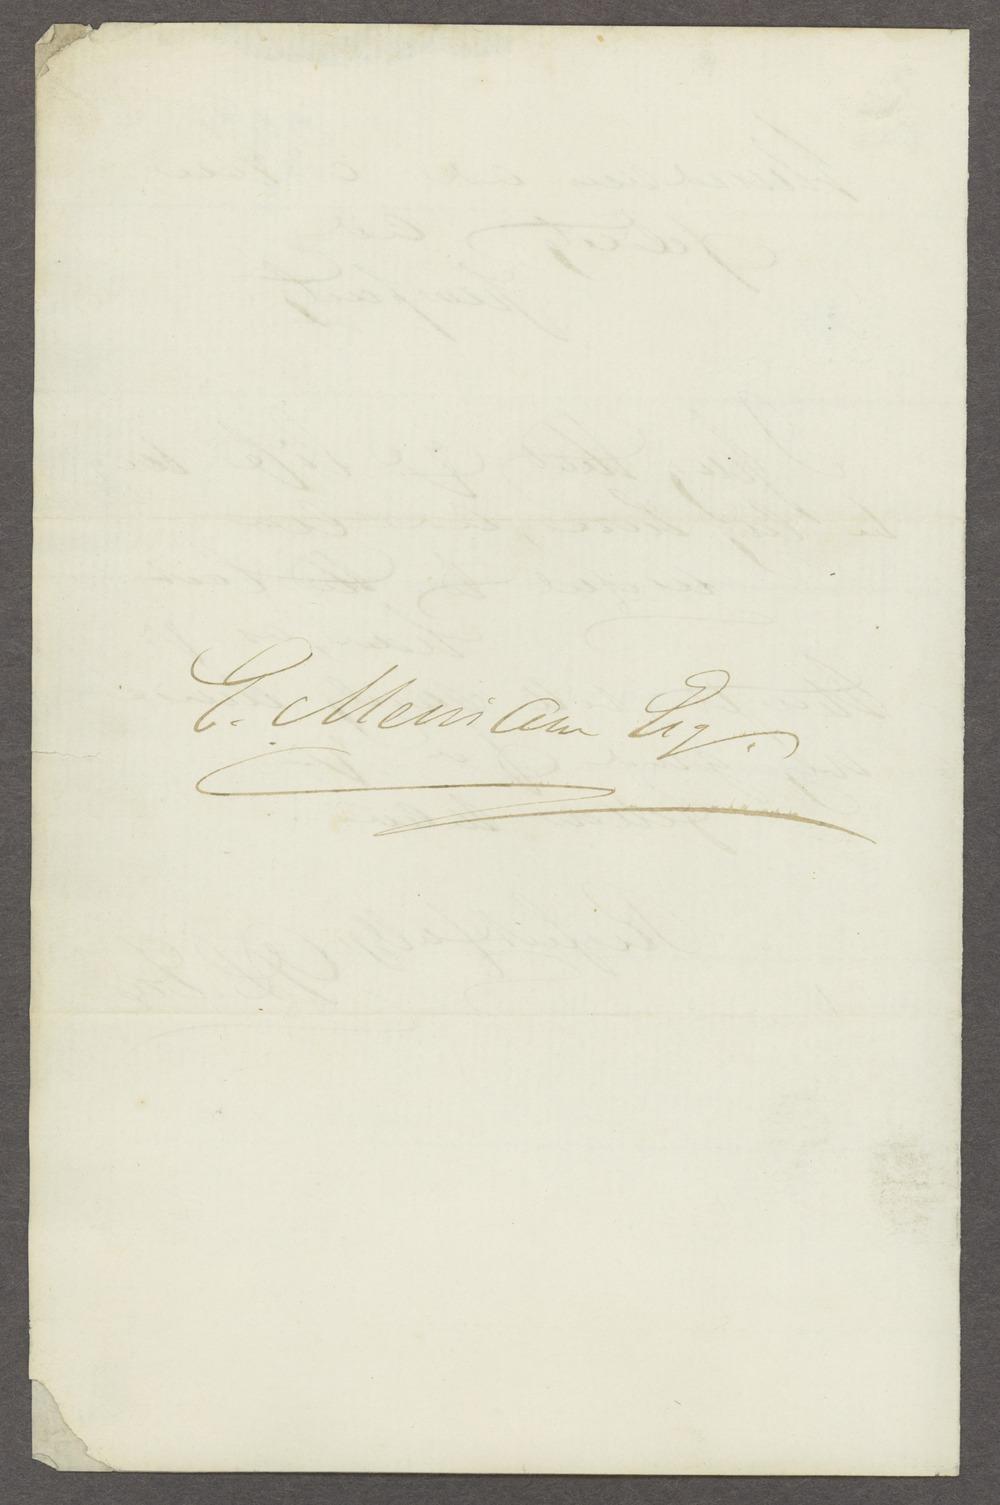 Dorothea Dix correspondence - 3